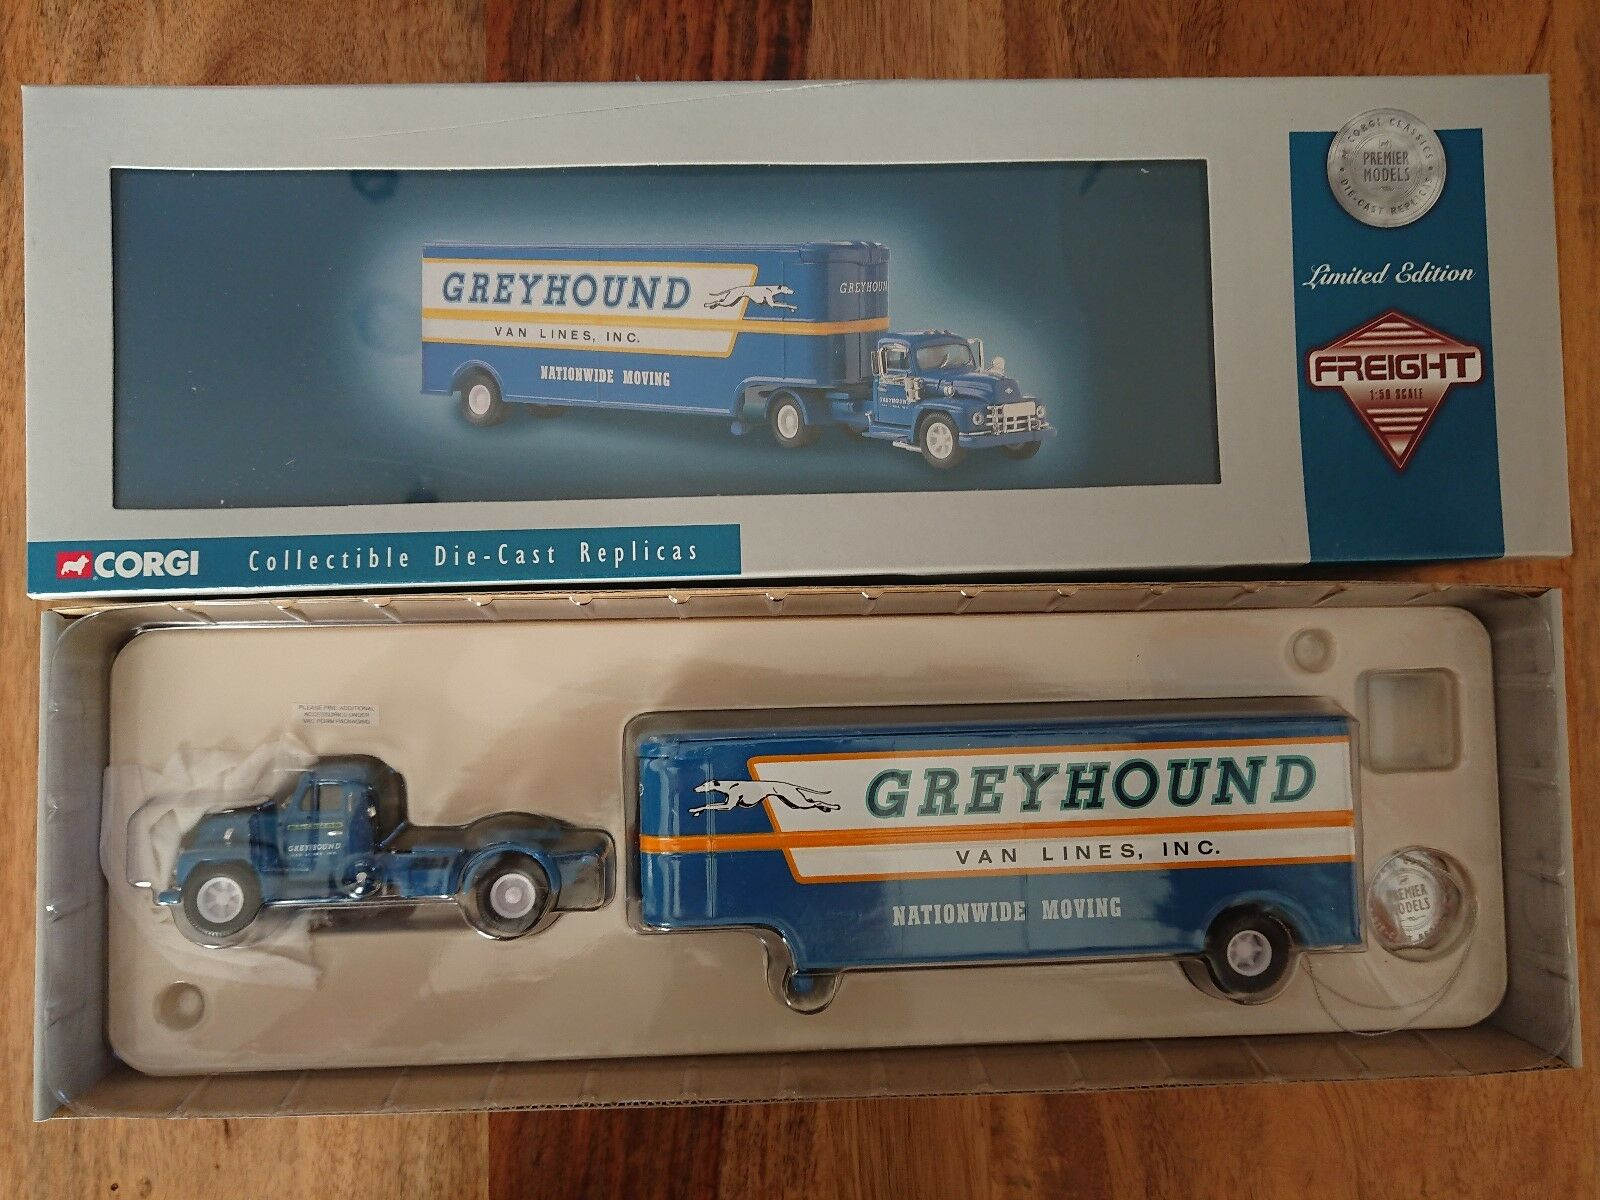 Corgi 53101 diamond t620 fruehauf grauhound - linien ltd. artikel nr. 0001 2500